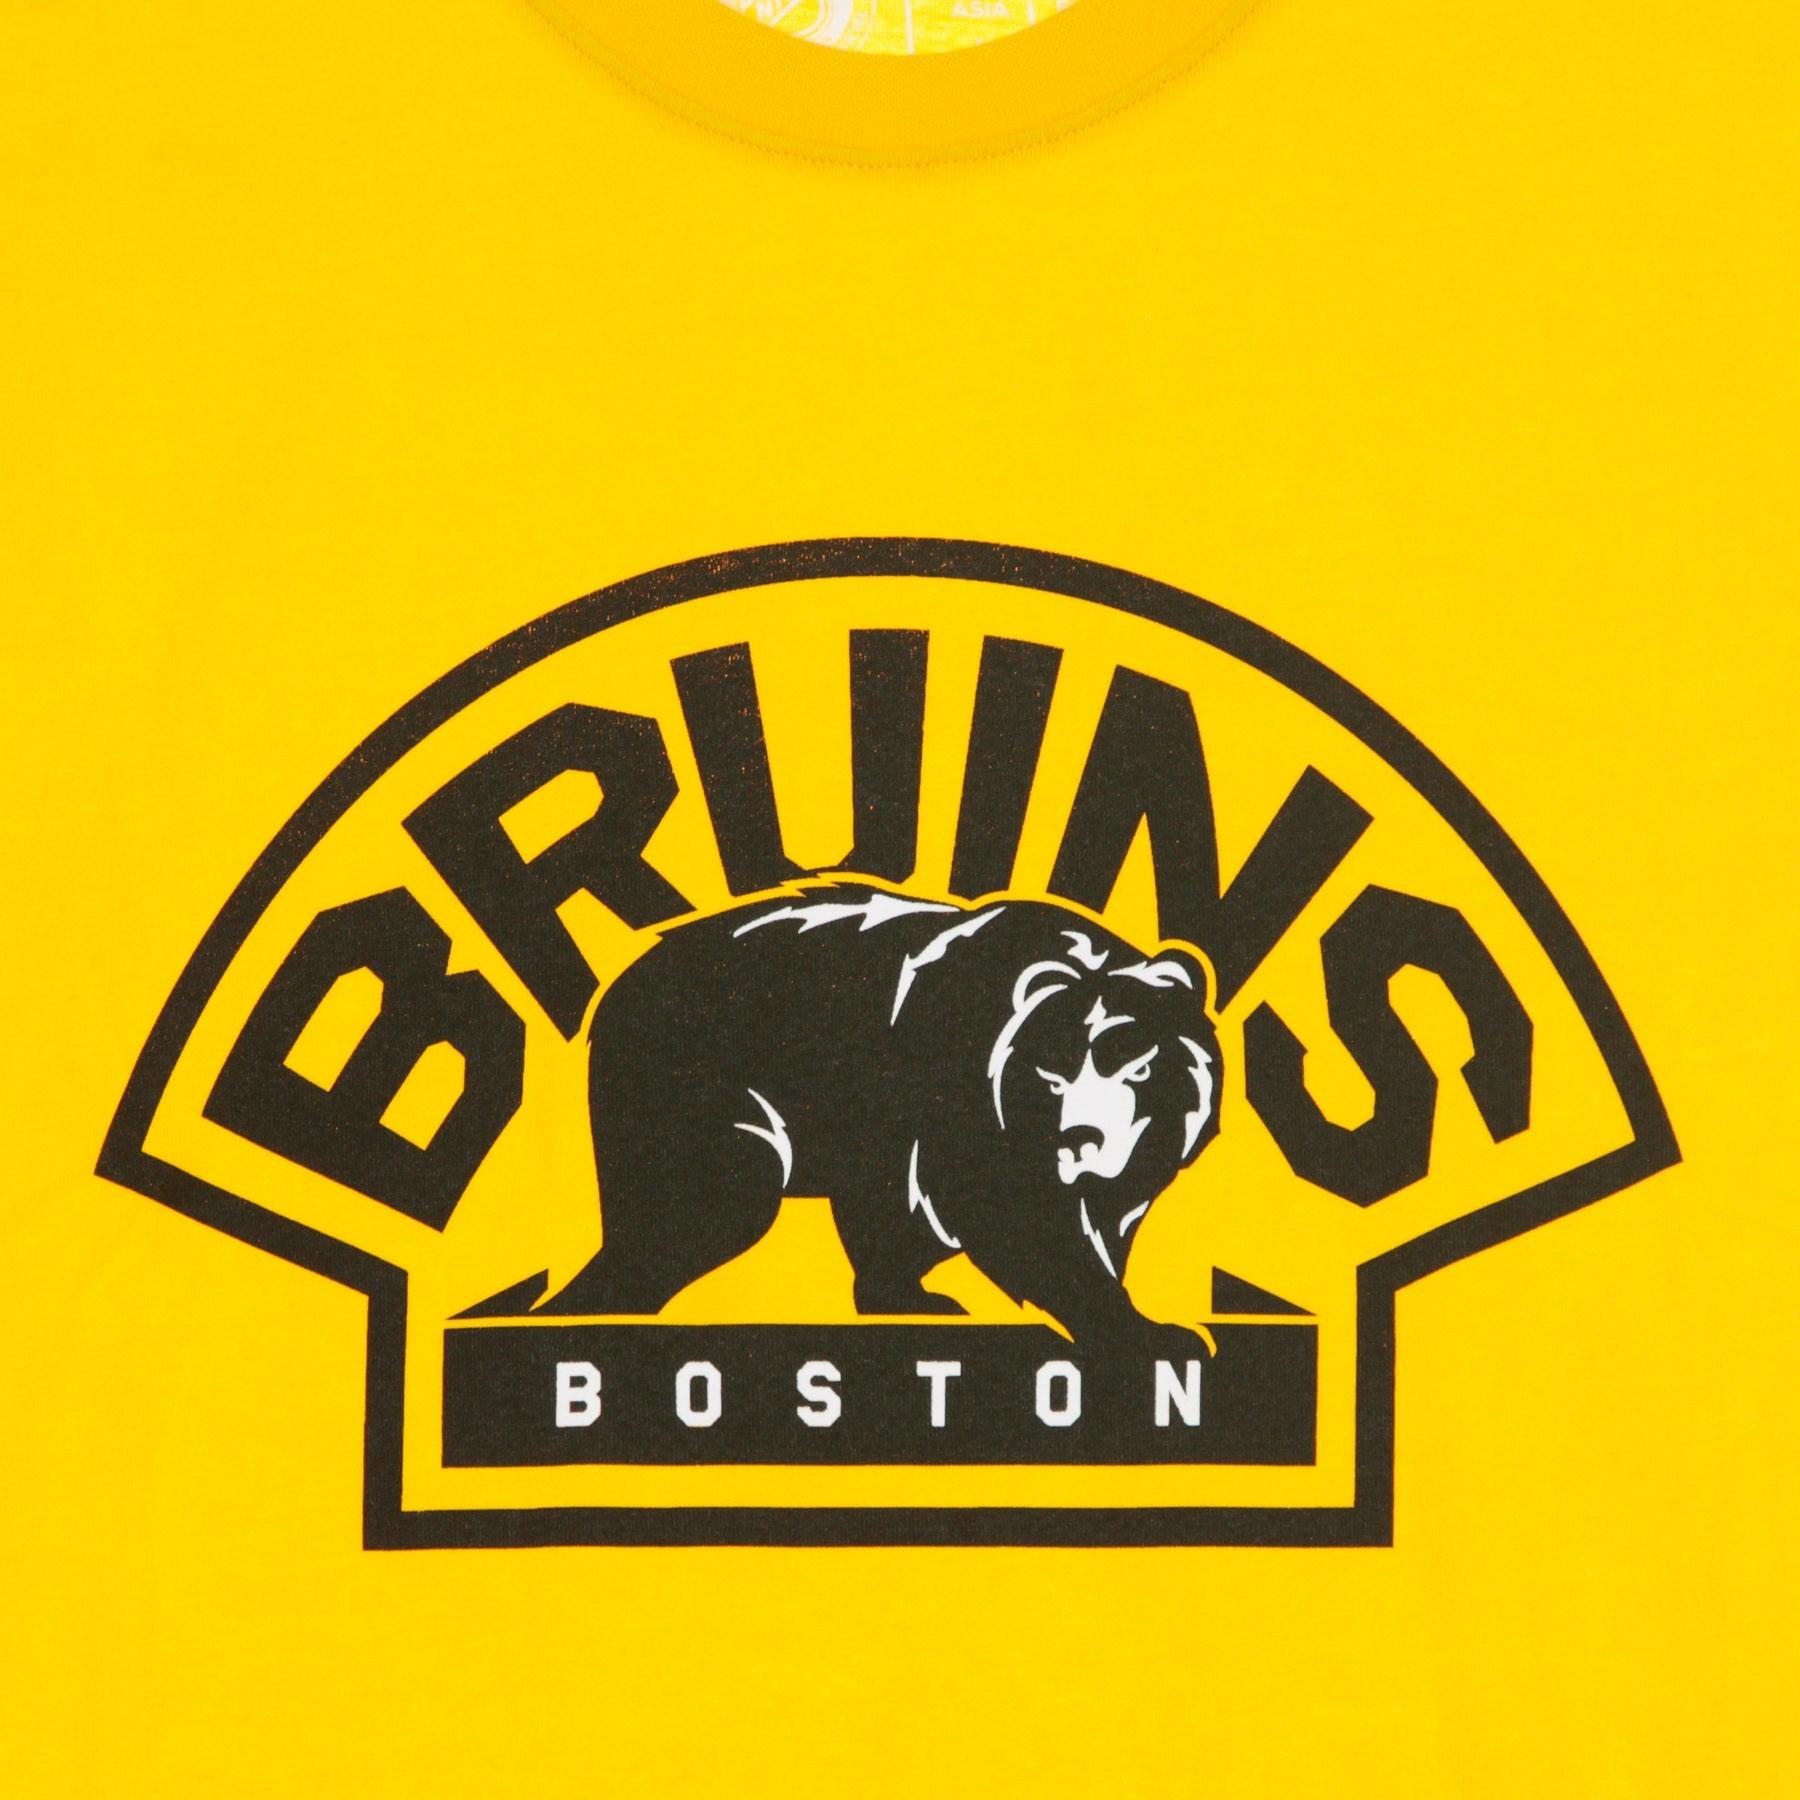 MAGLIETTA NHL ICONIC SECONDARY COLOUR LOGO GRAPHIC T-SHIRT BOSBRU Array